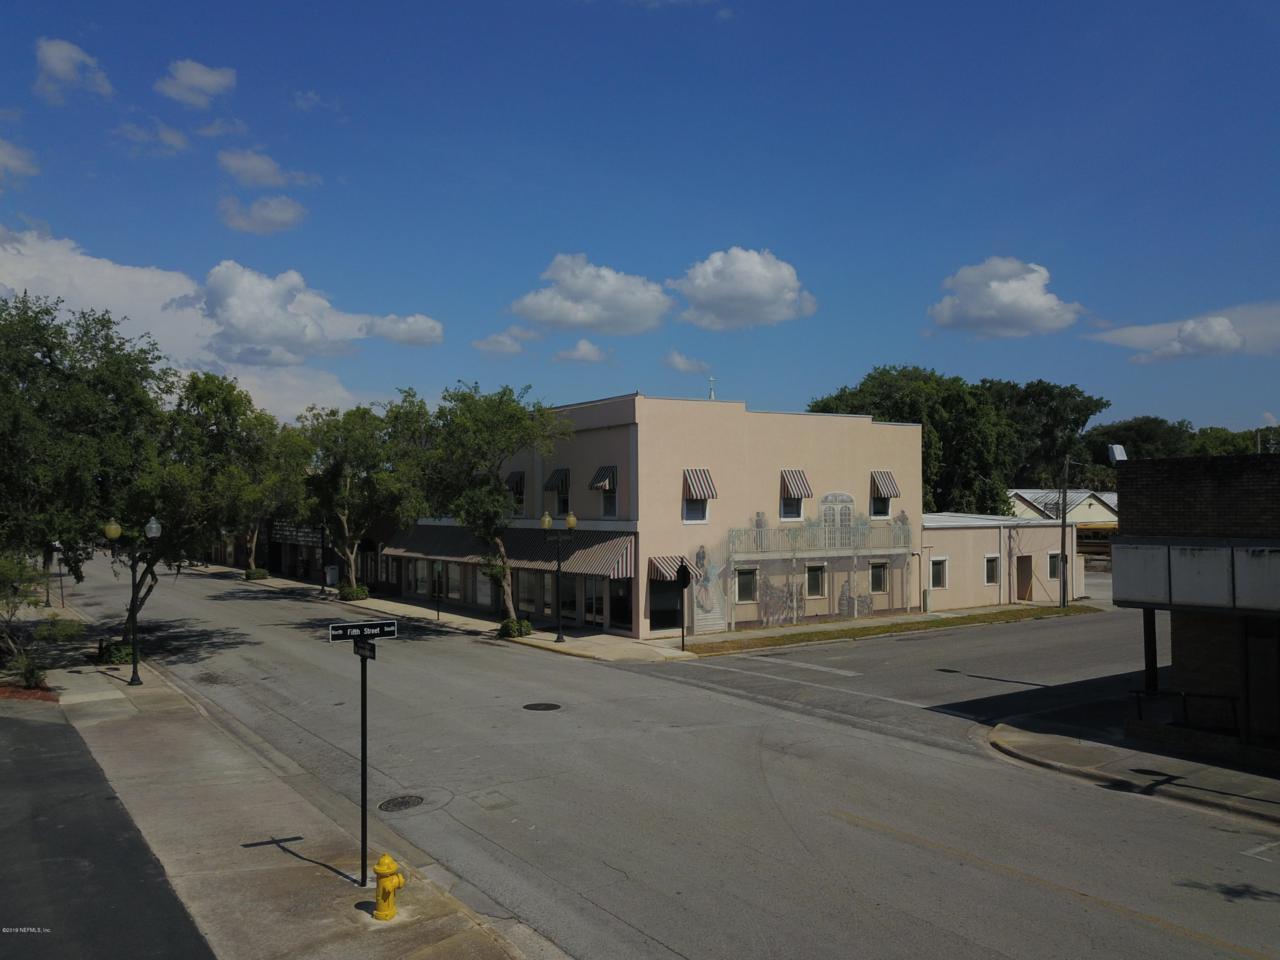 419 St Johns Ave - Photo 1